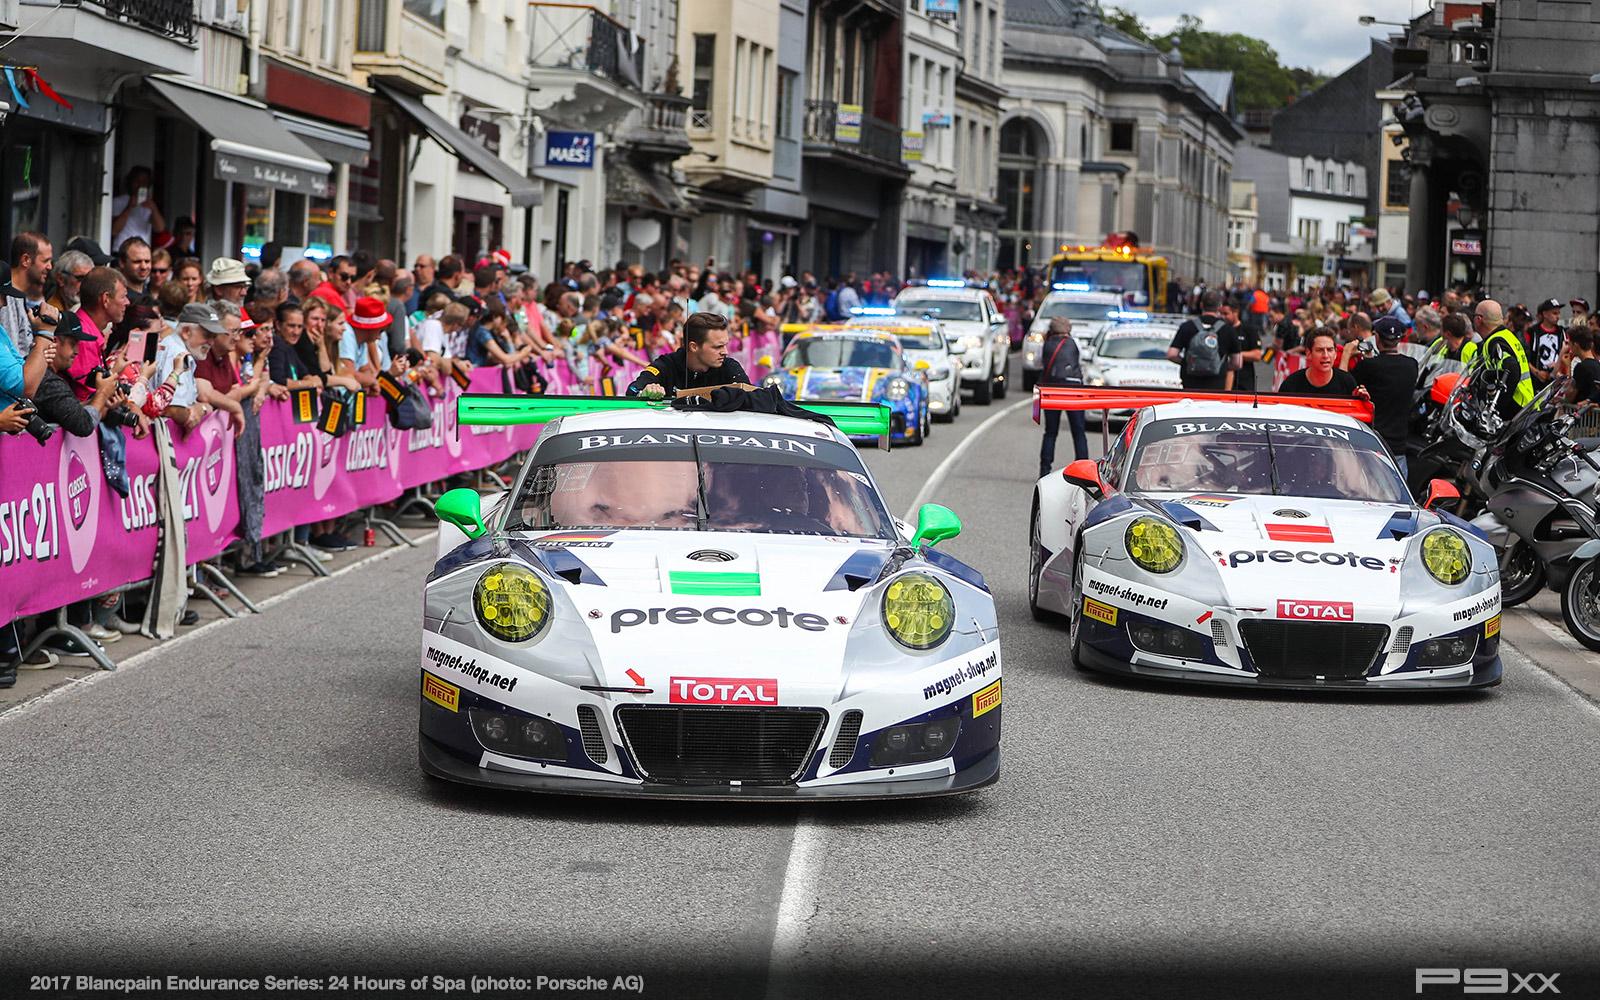 2017-24-Hours-of-Spa-Porsche-298